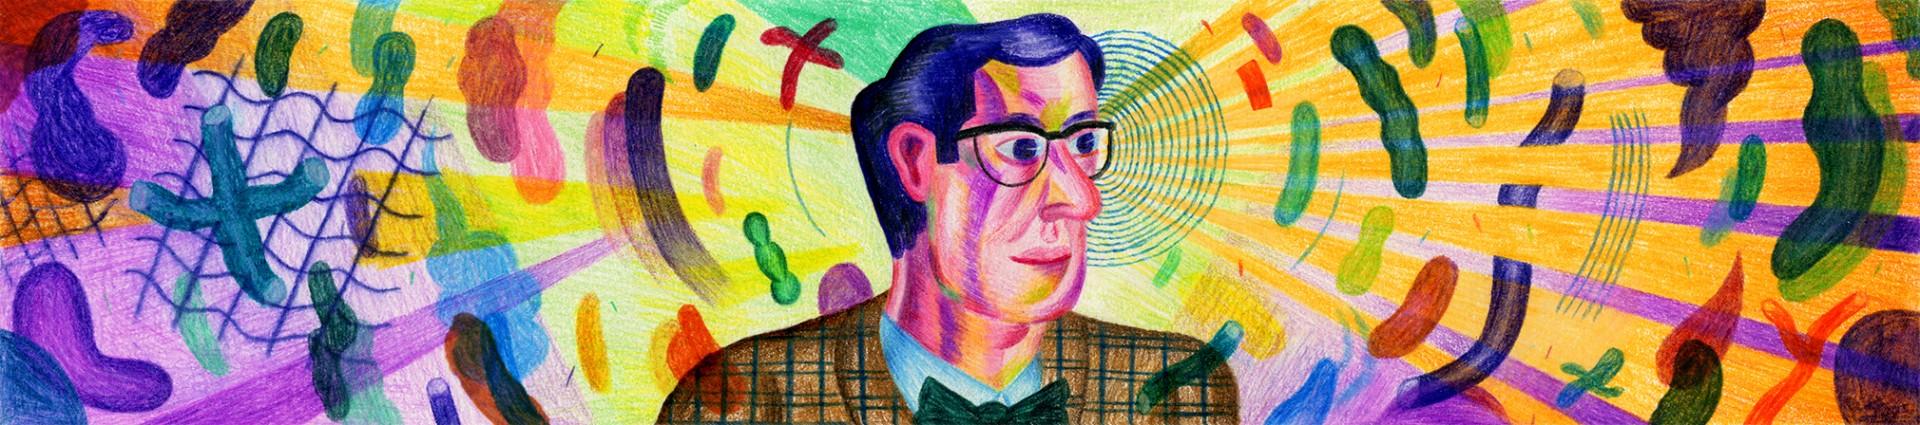 012 Asimovx2020sw2020 Isaac Asimov Essays Essay Awful On Creativity Intelligence 1920